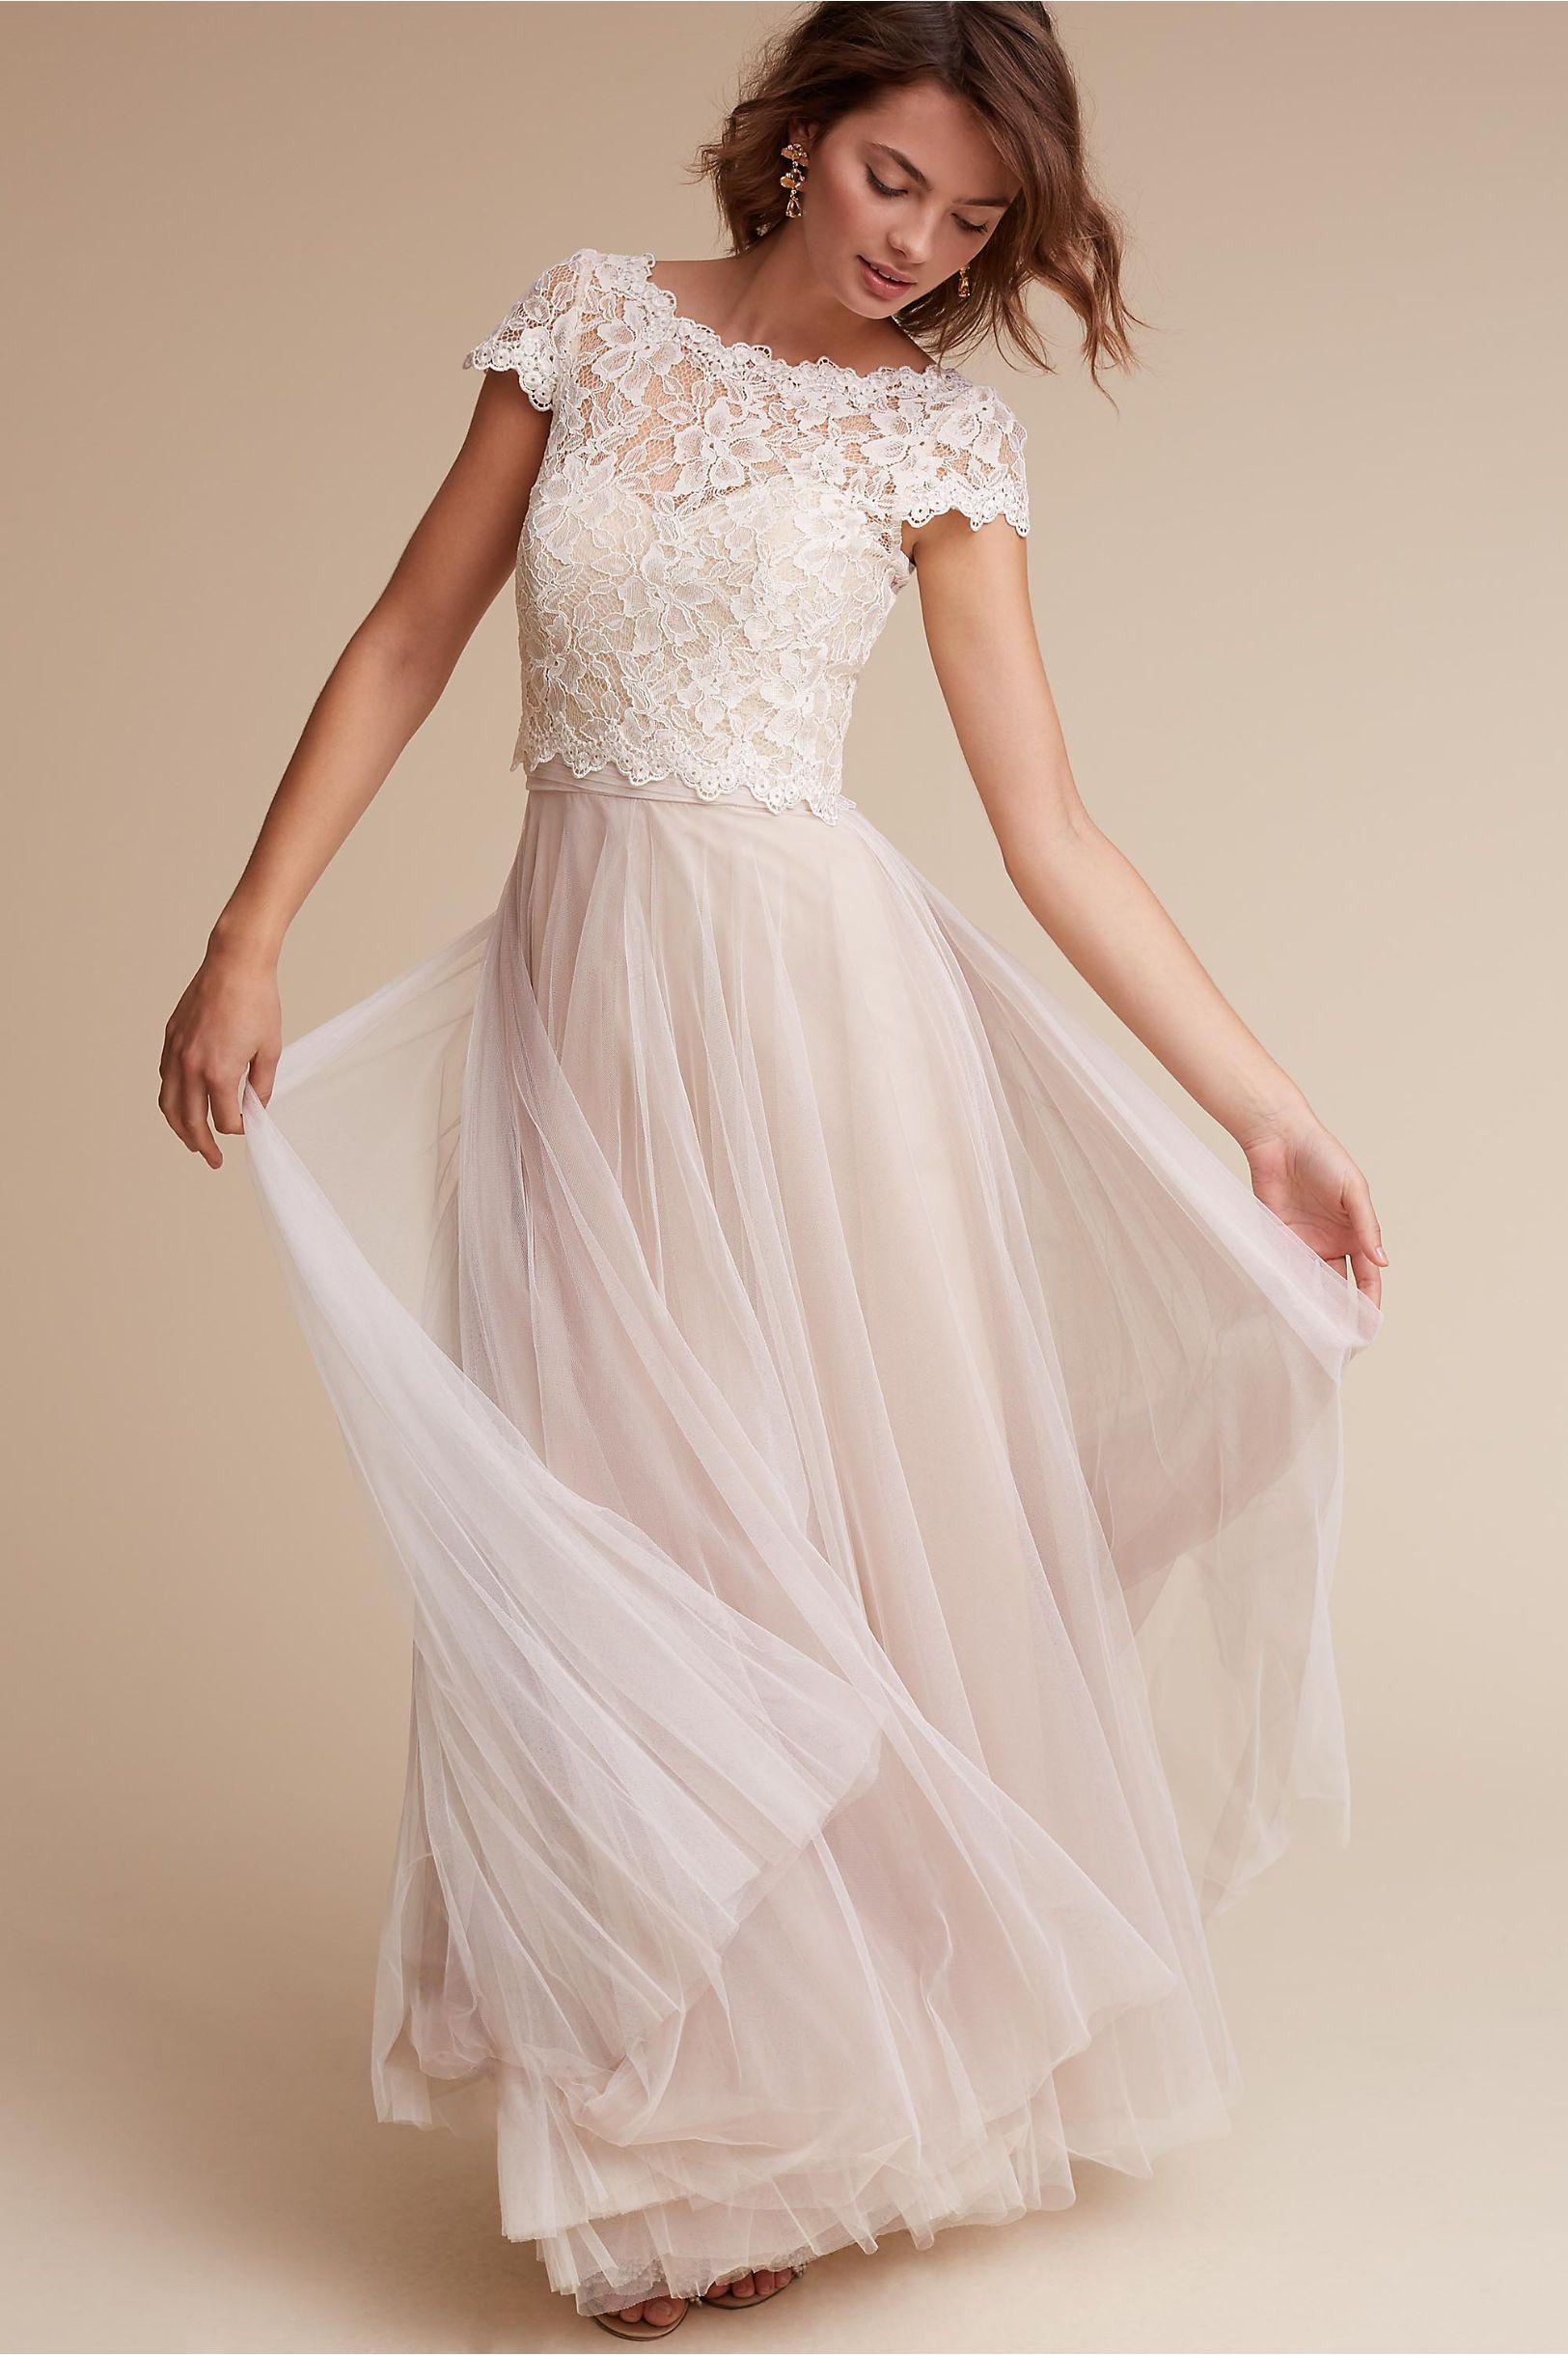 BHLDN Calla Gown in Bride | BHLDN | Our North Shore Wedding ...